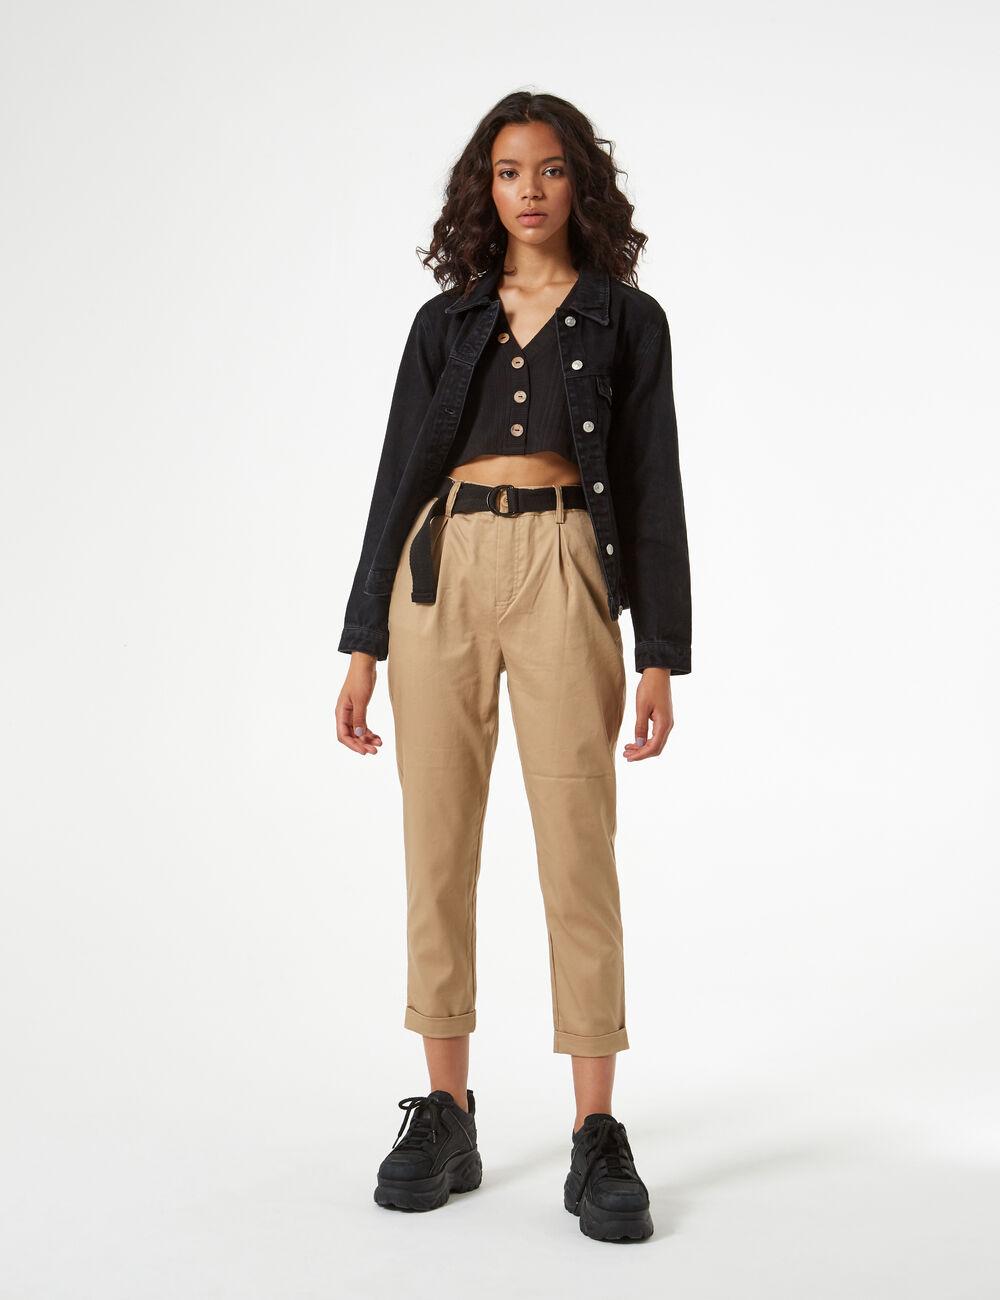 pantalon avec ceinture femme jennyfer. Black Bedroom Furniture Sets. Home Design Ideas